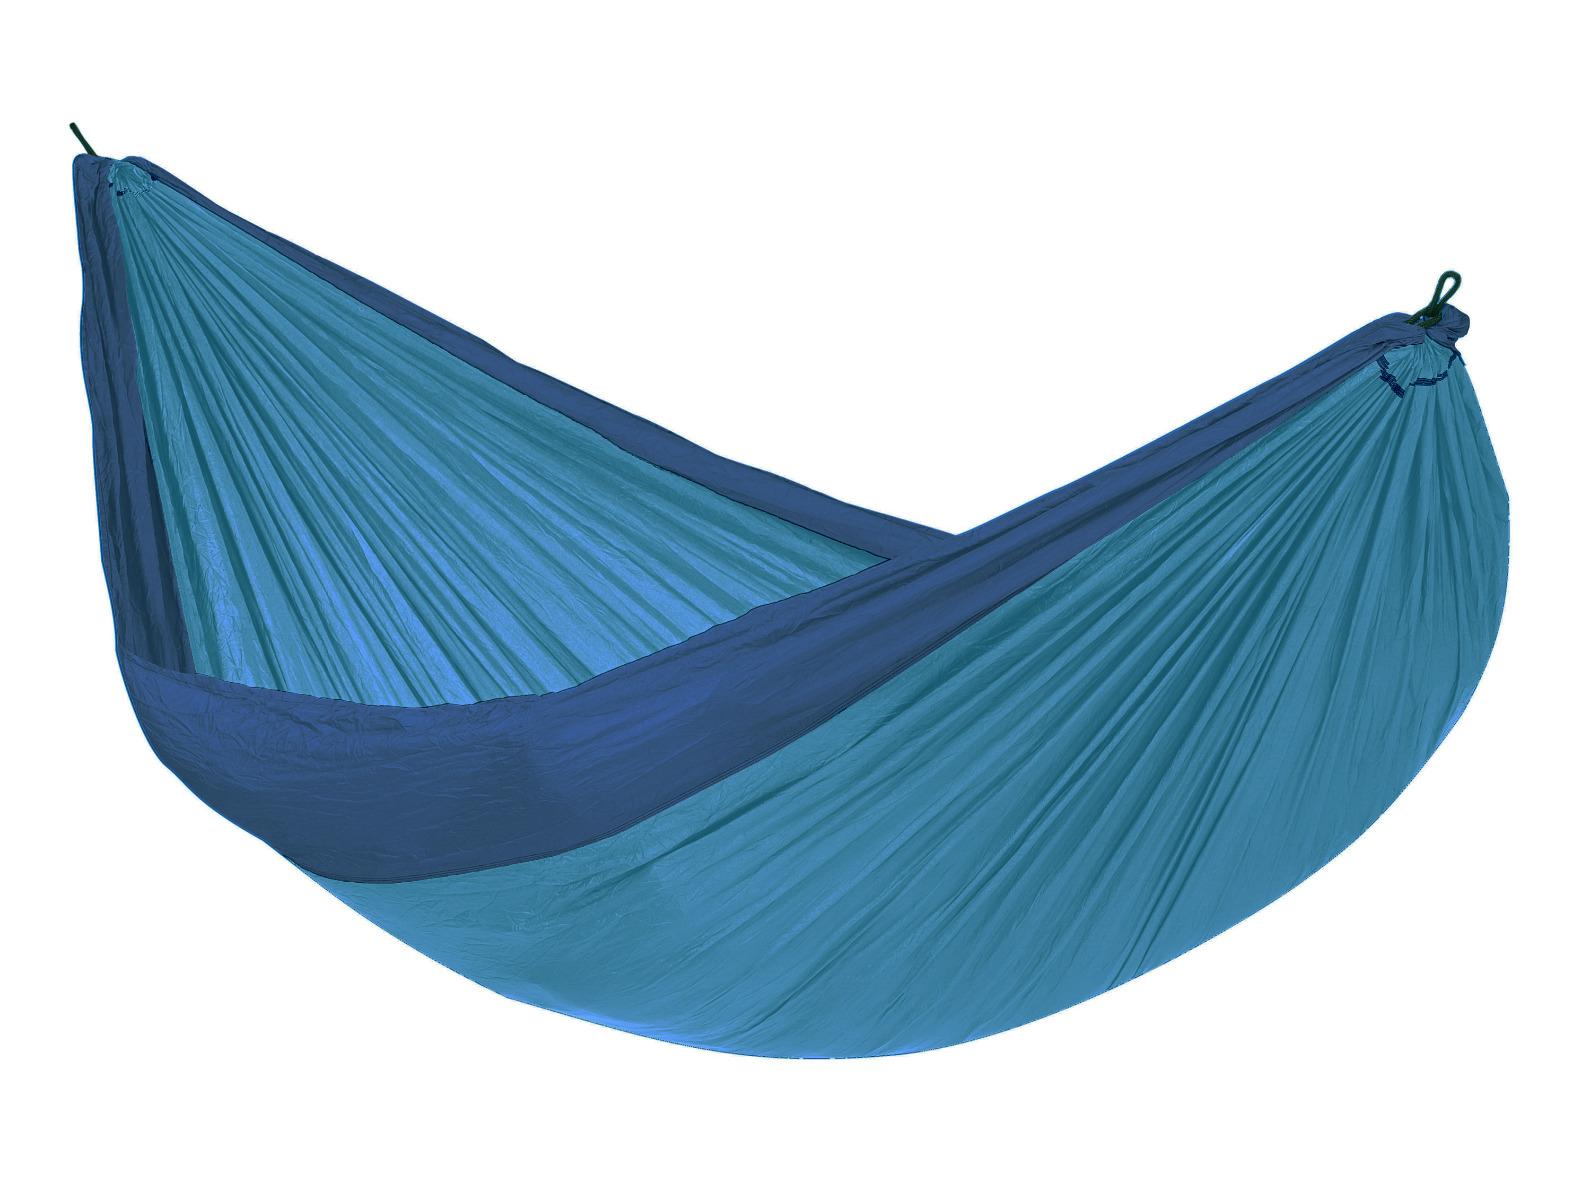 'Outdoor' Majolia E�npersoons Reishangmat - Blauw - Tropilex �